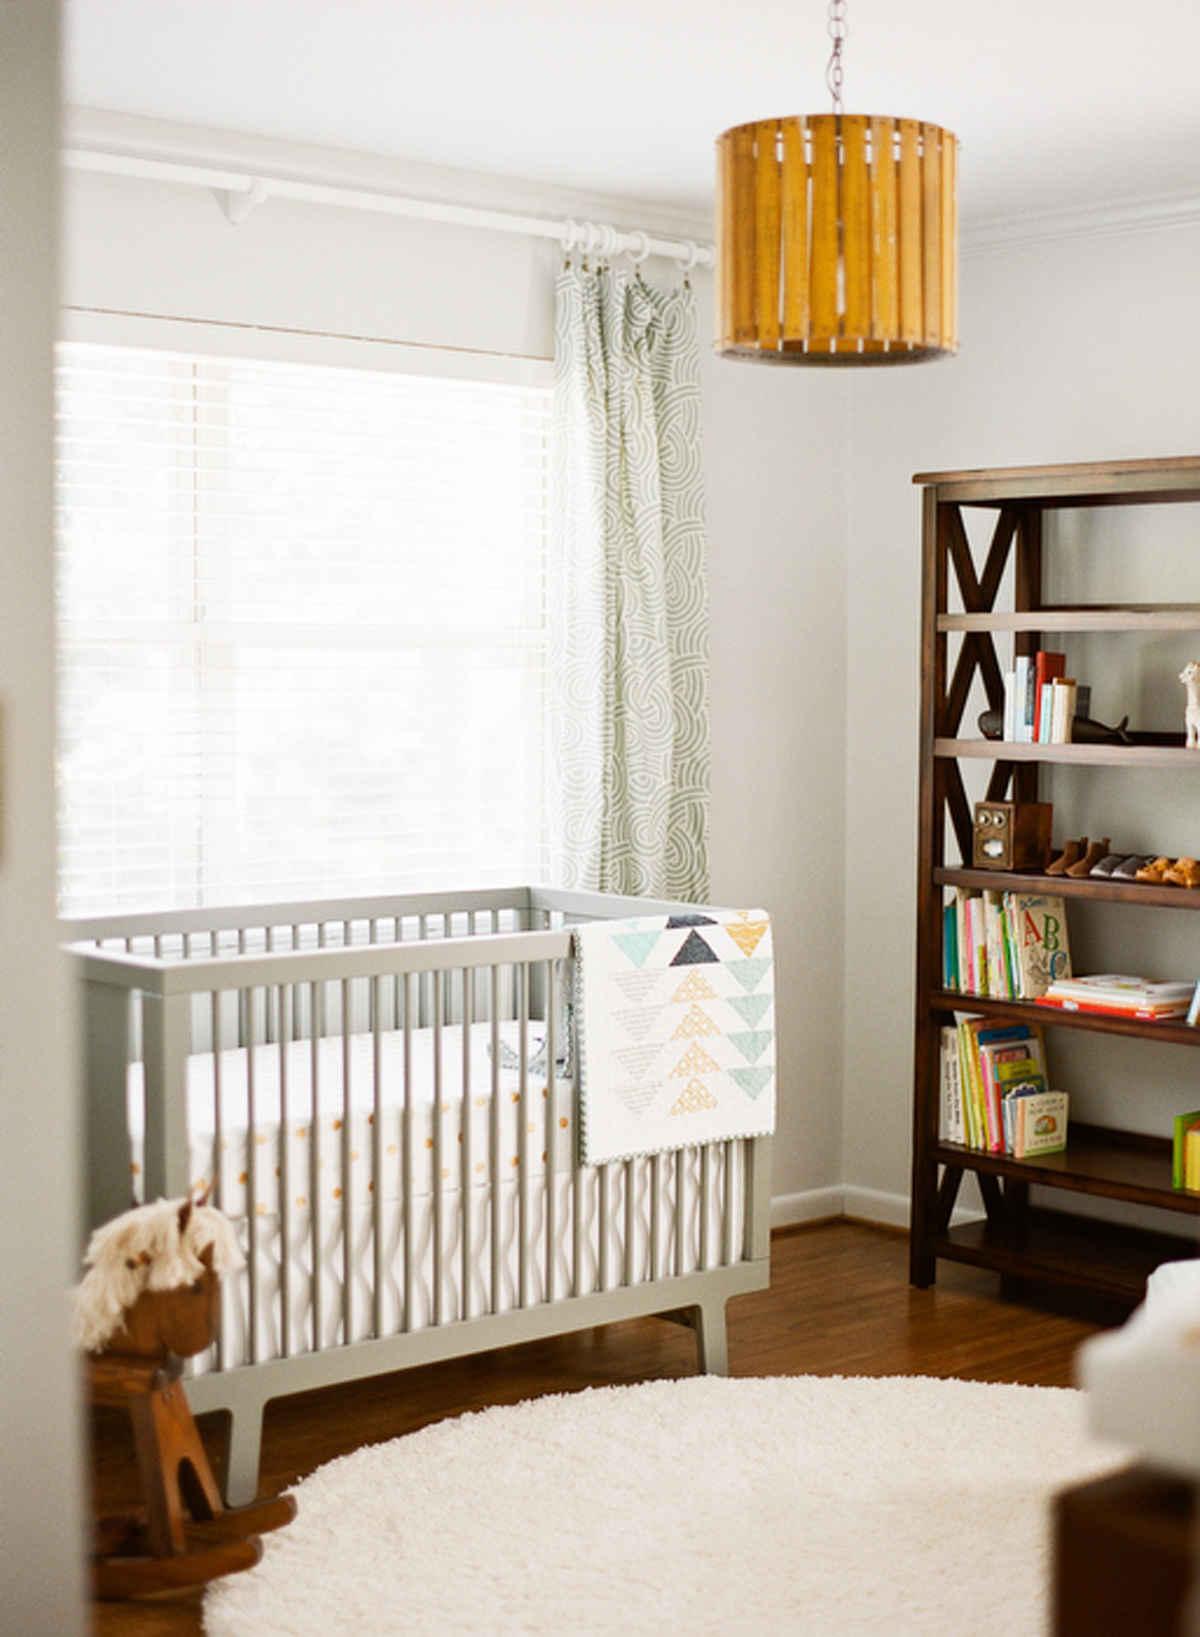 Nursery inspiration baby room ideas lay baby lay - Modern boy nursery themes ...